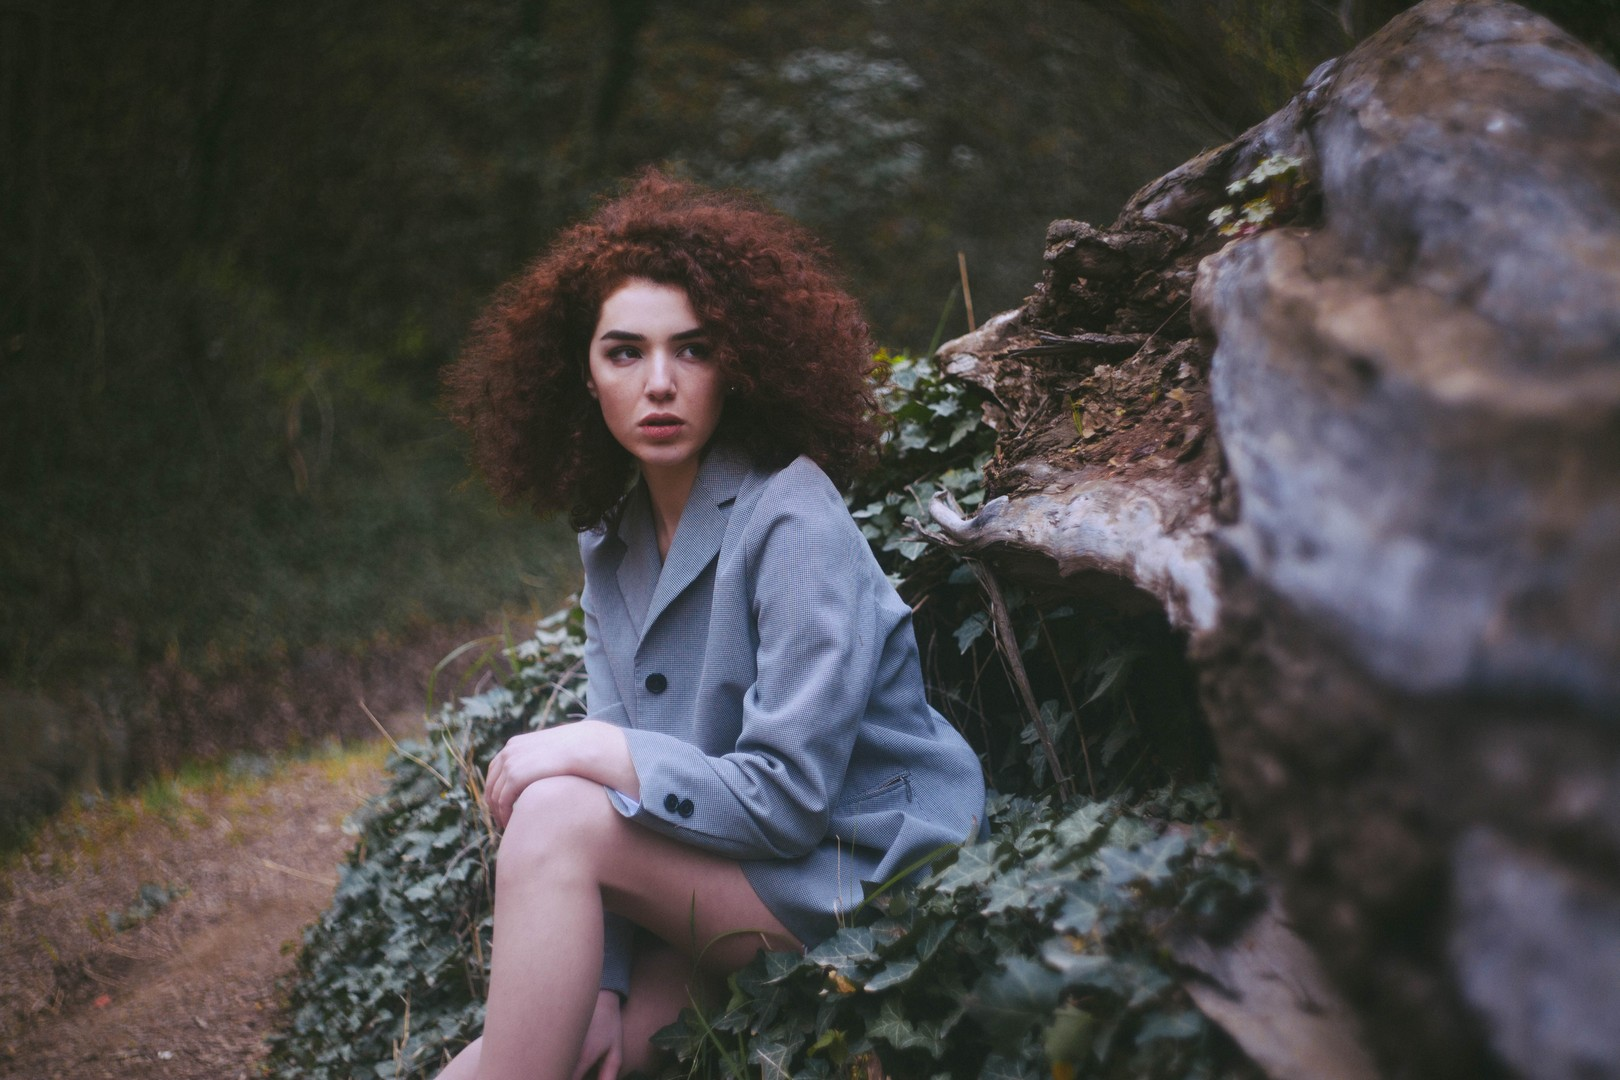 cortes de cabelo feminino medio 13 - Cortes de cabelo feminino médio: dicas e ideias para todo tipo de fio